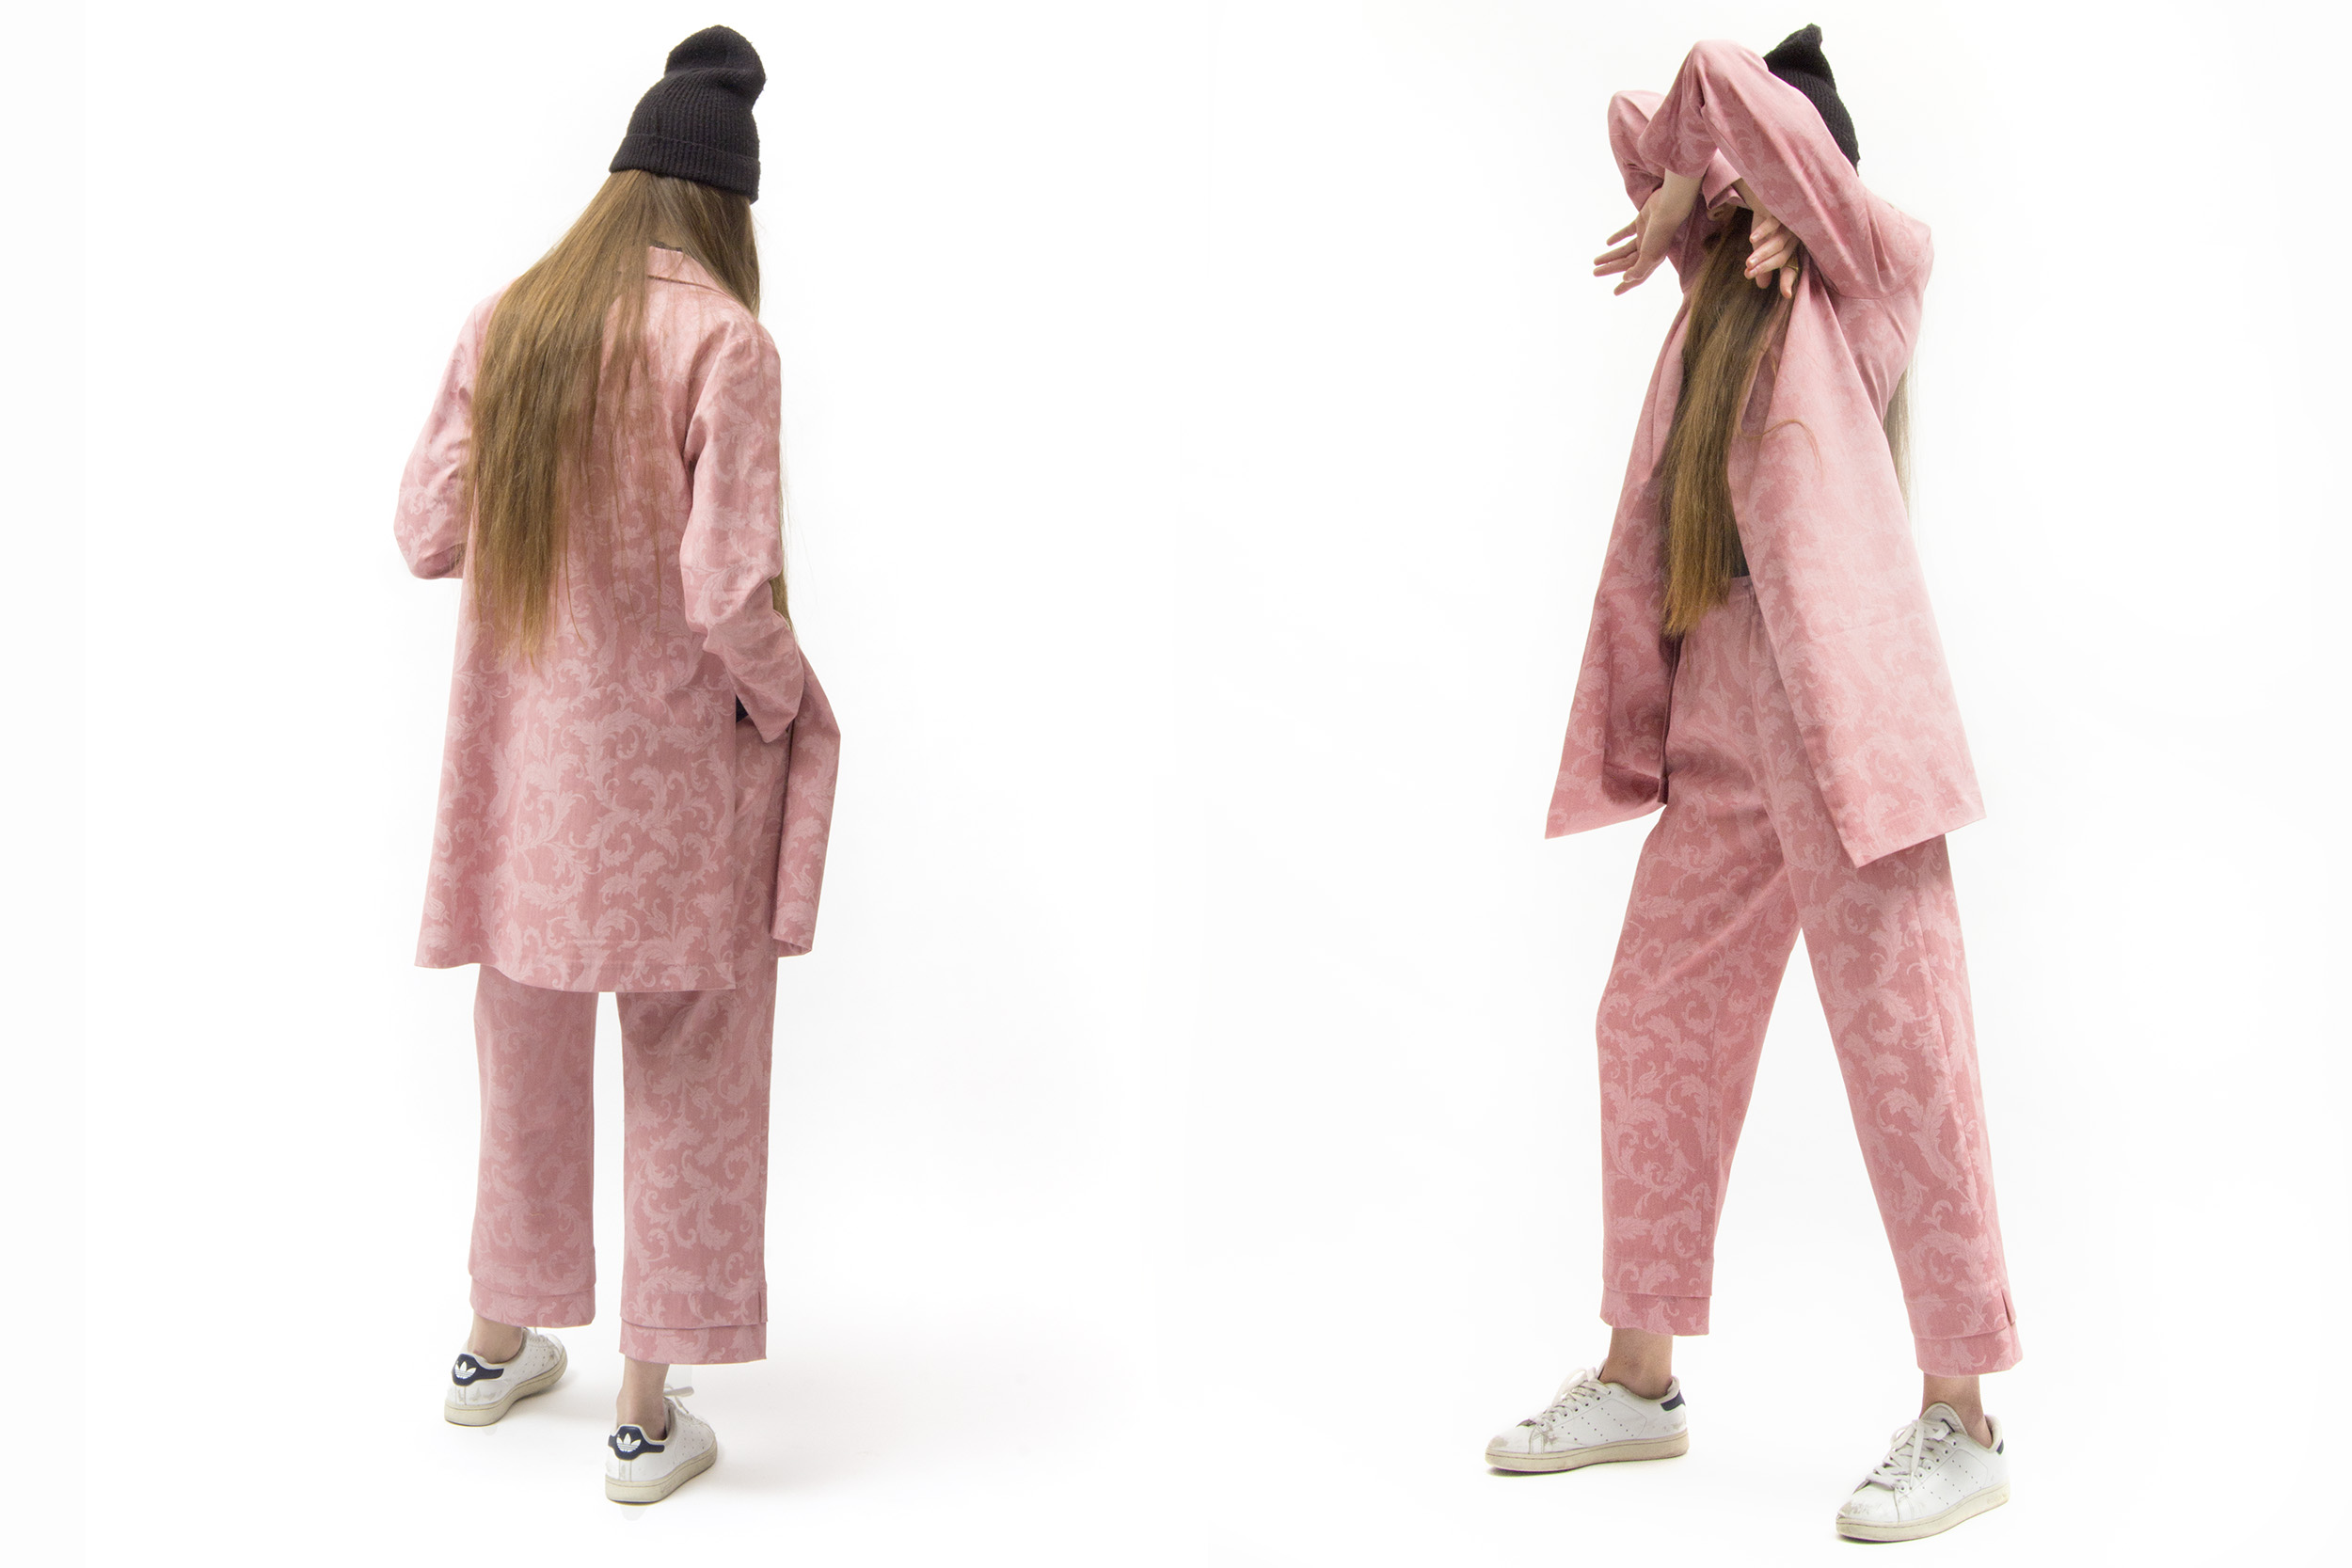 chiara_sonda_fashion_berto_for_young_talents_pink.jpg